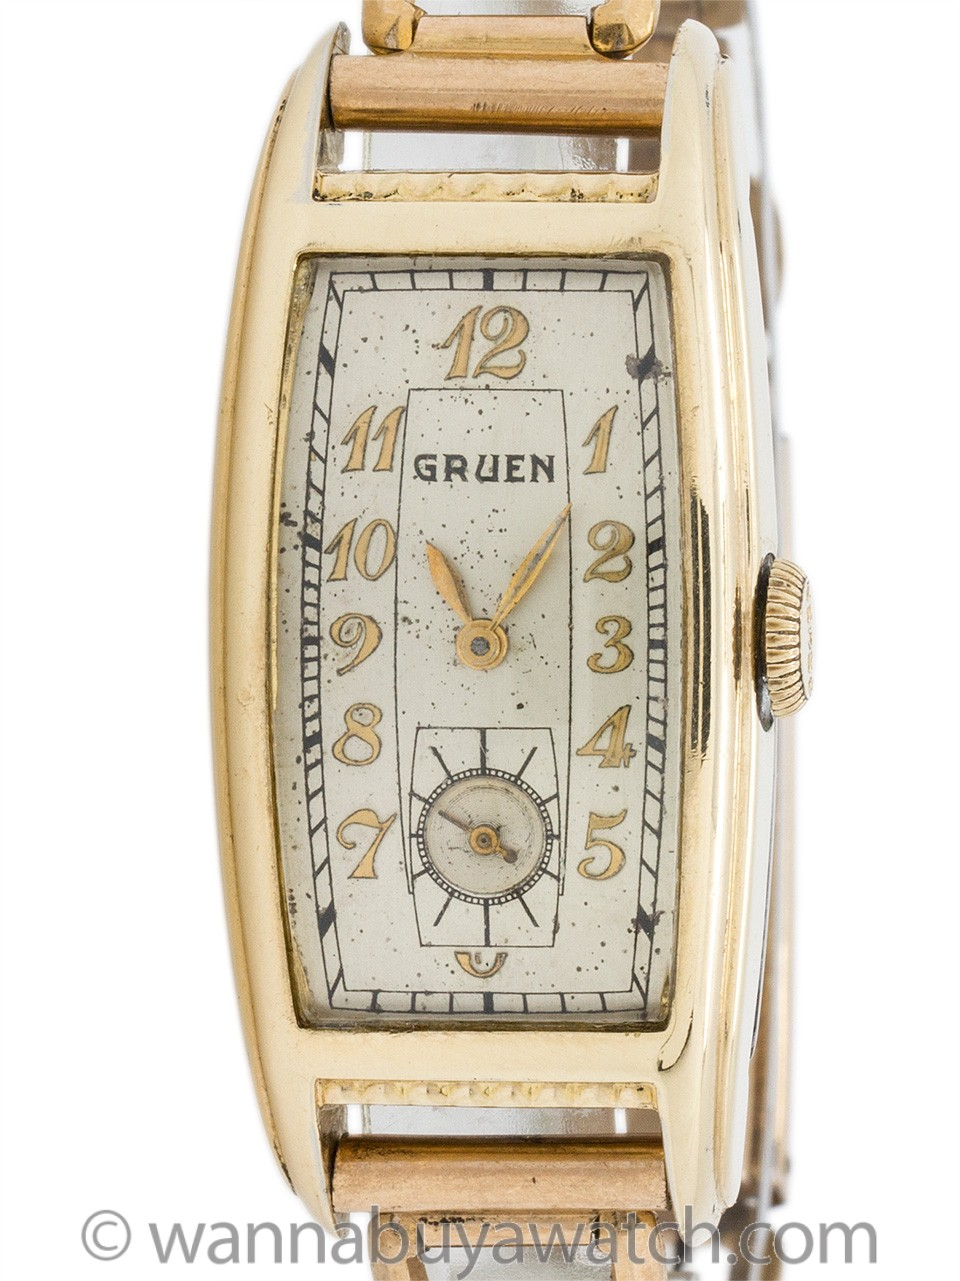 Gruen Curvex Style Gold Filled circa 1930's